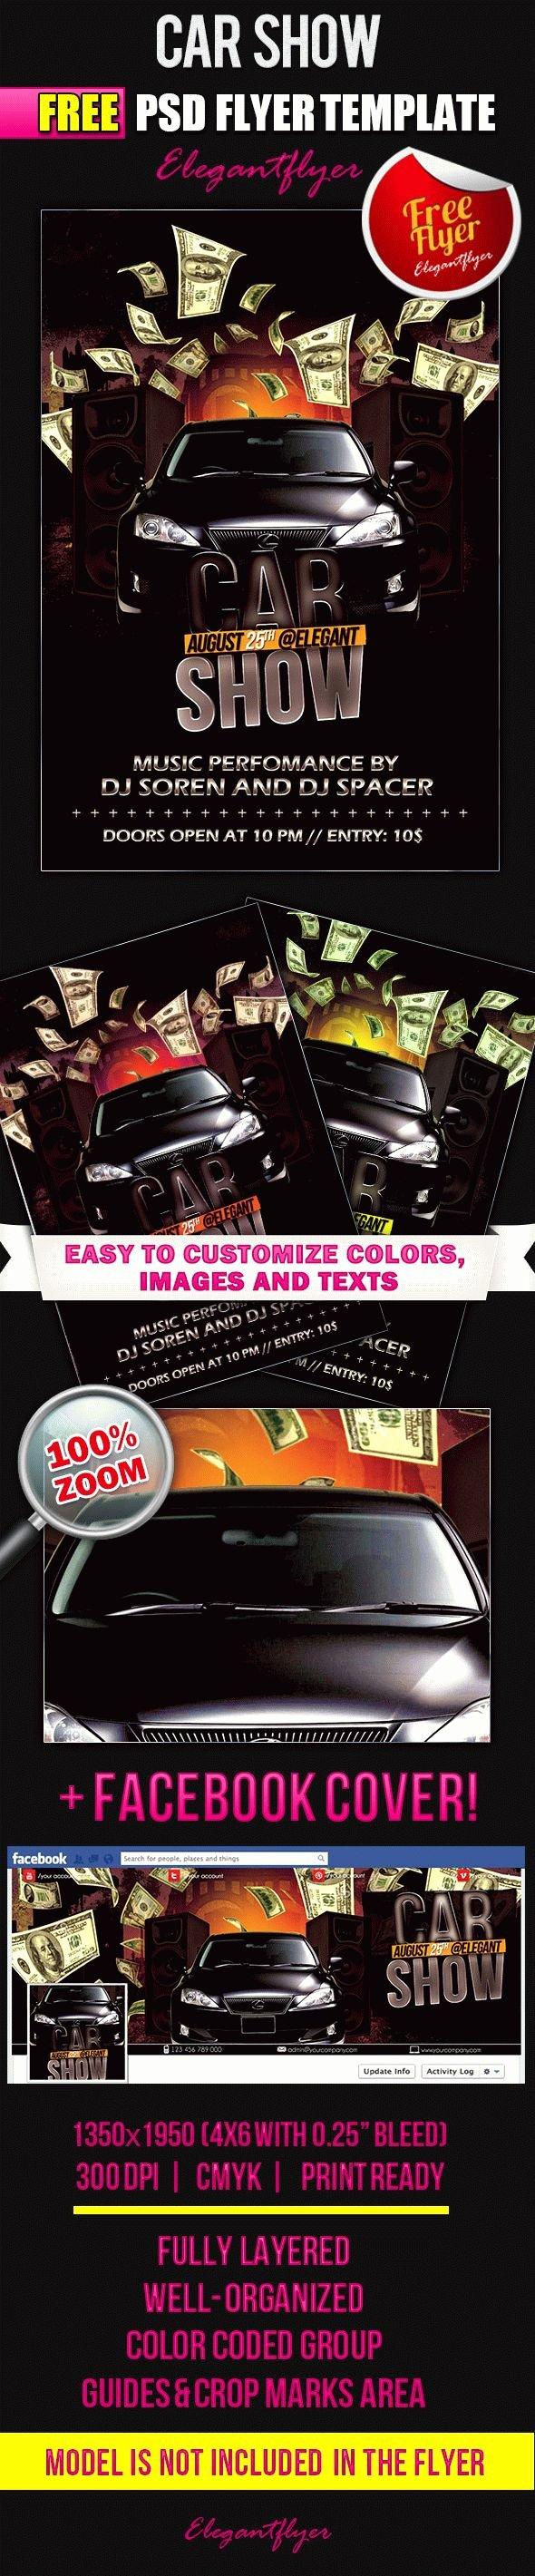 Car Show Flyer Template Fresh Car Show – Free Flyer Psd Template – by Elegantflyer